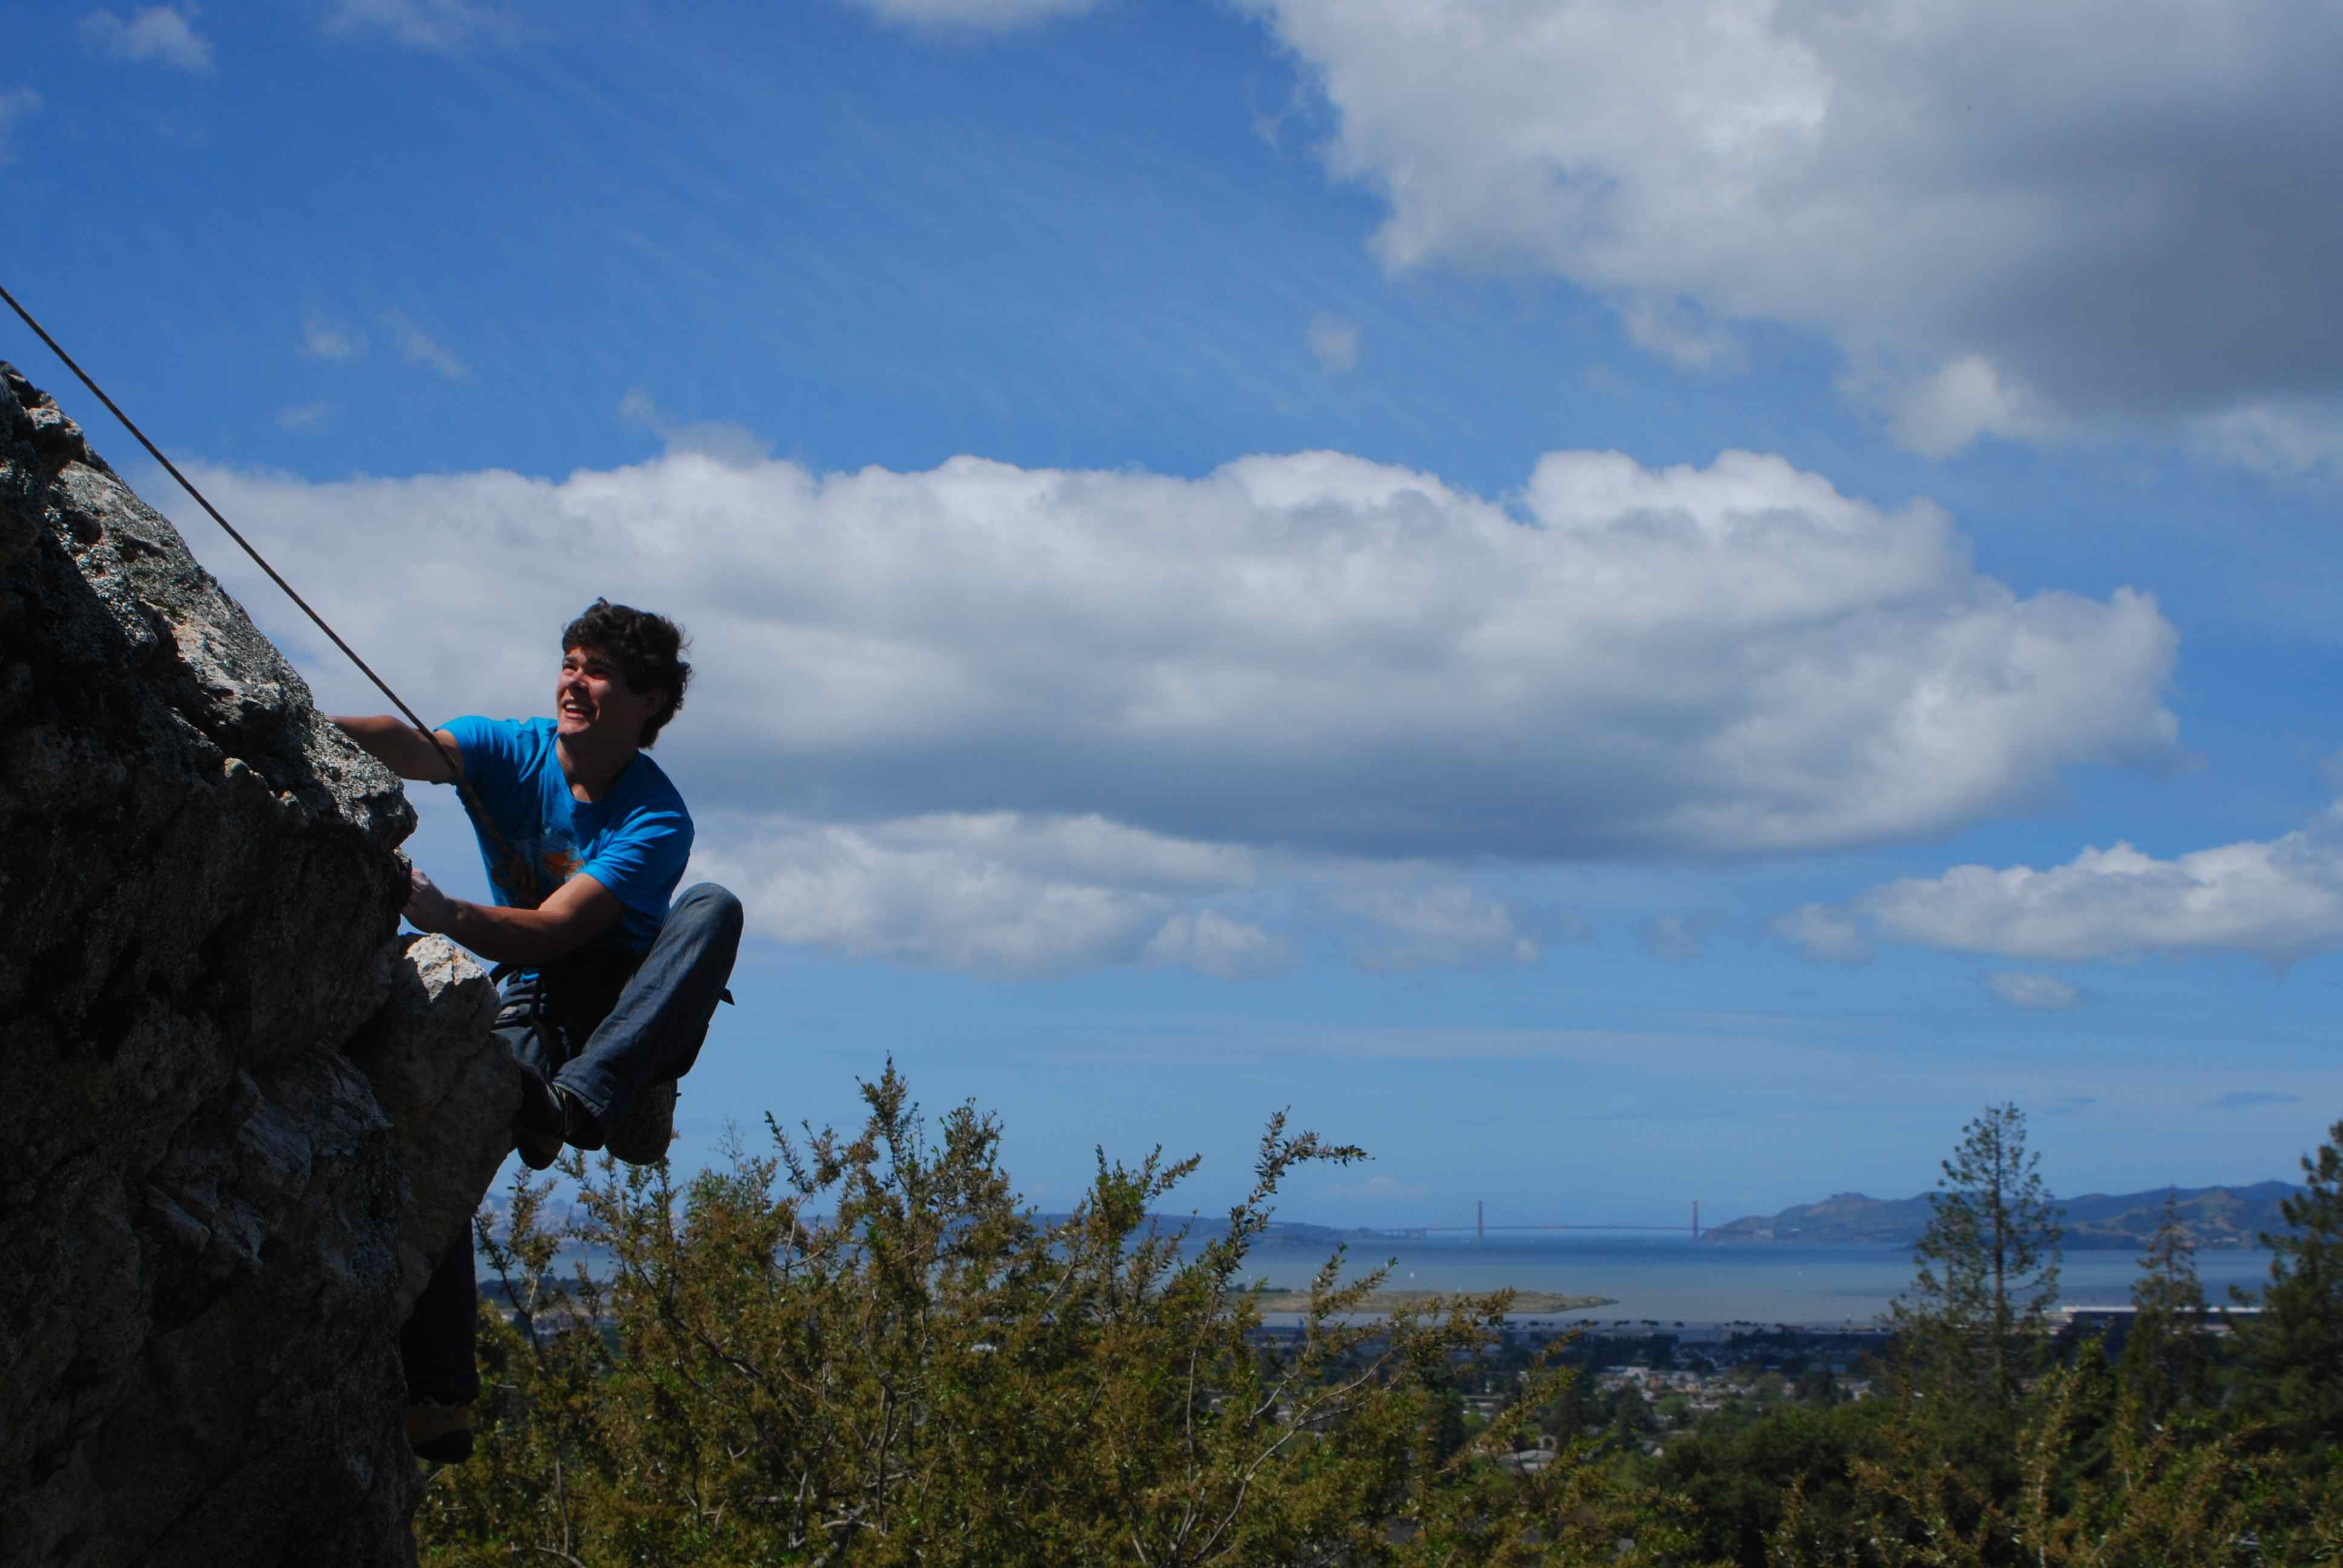 Ian climbing